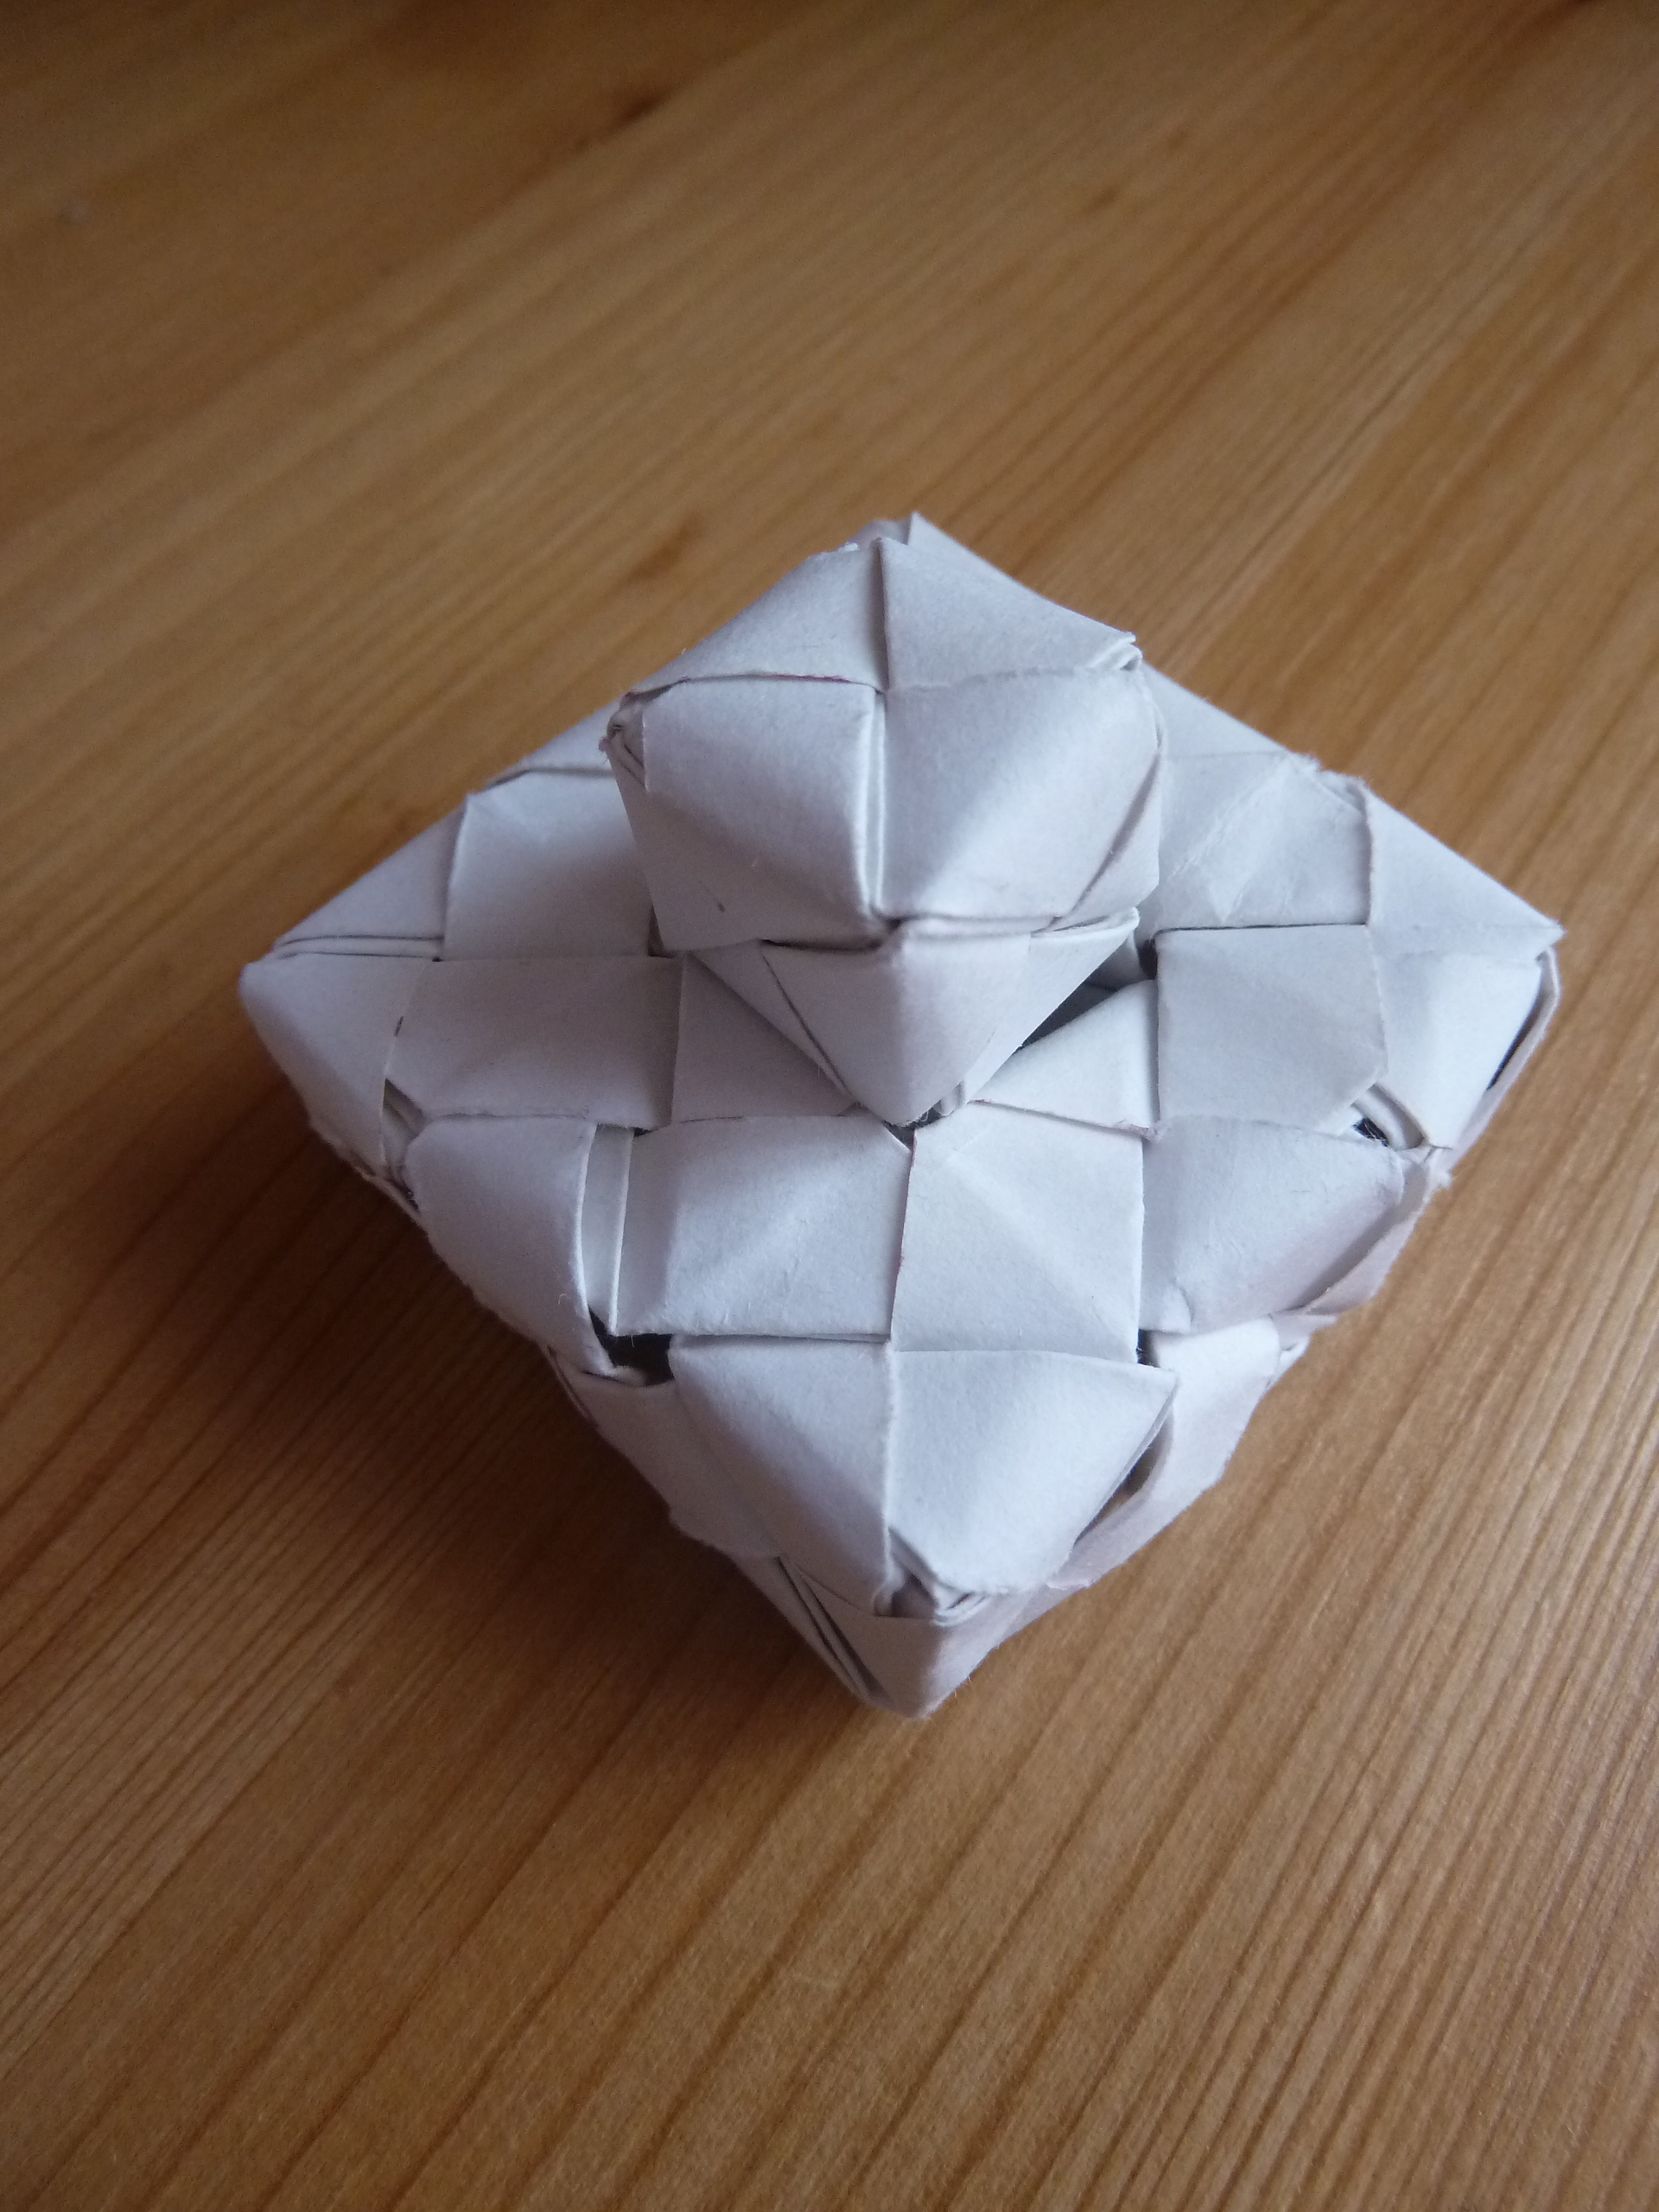 base for modular origami